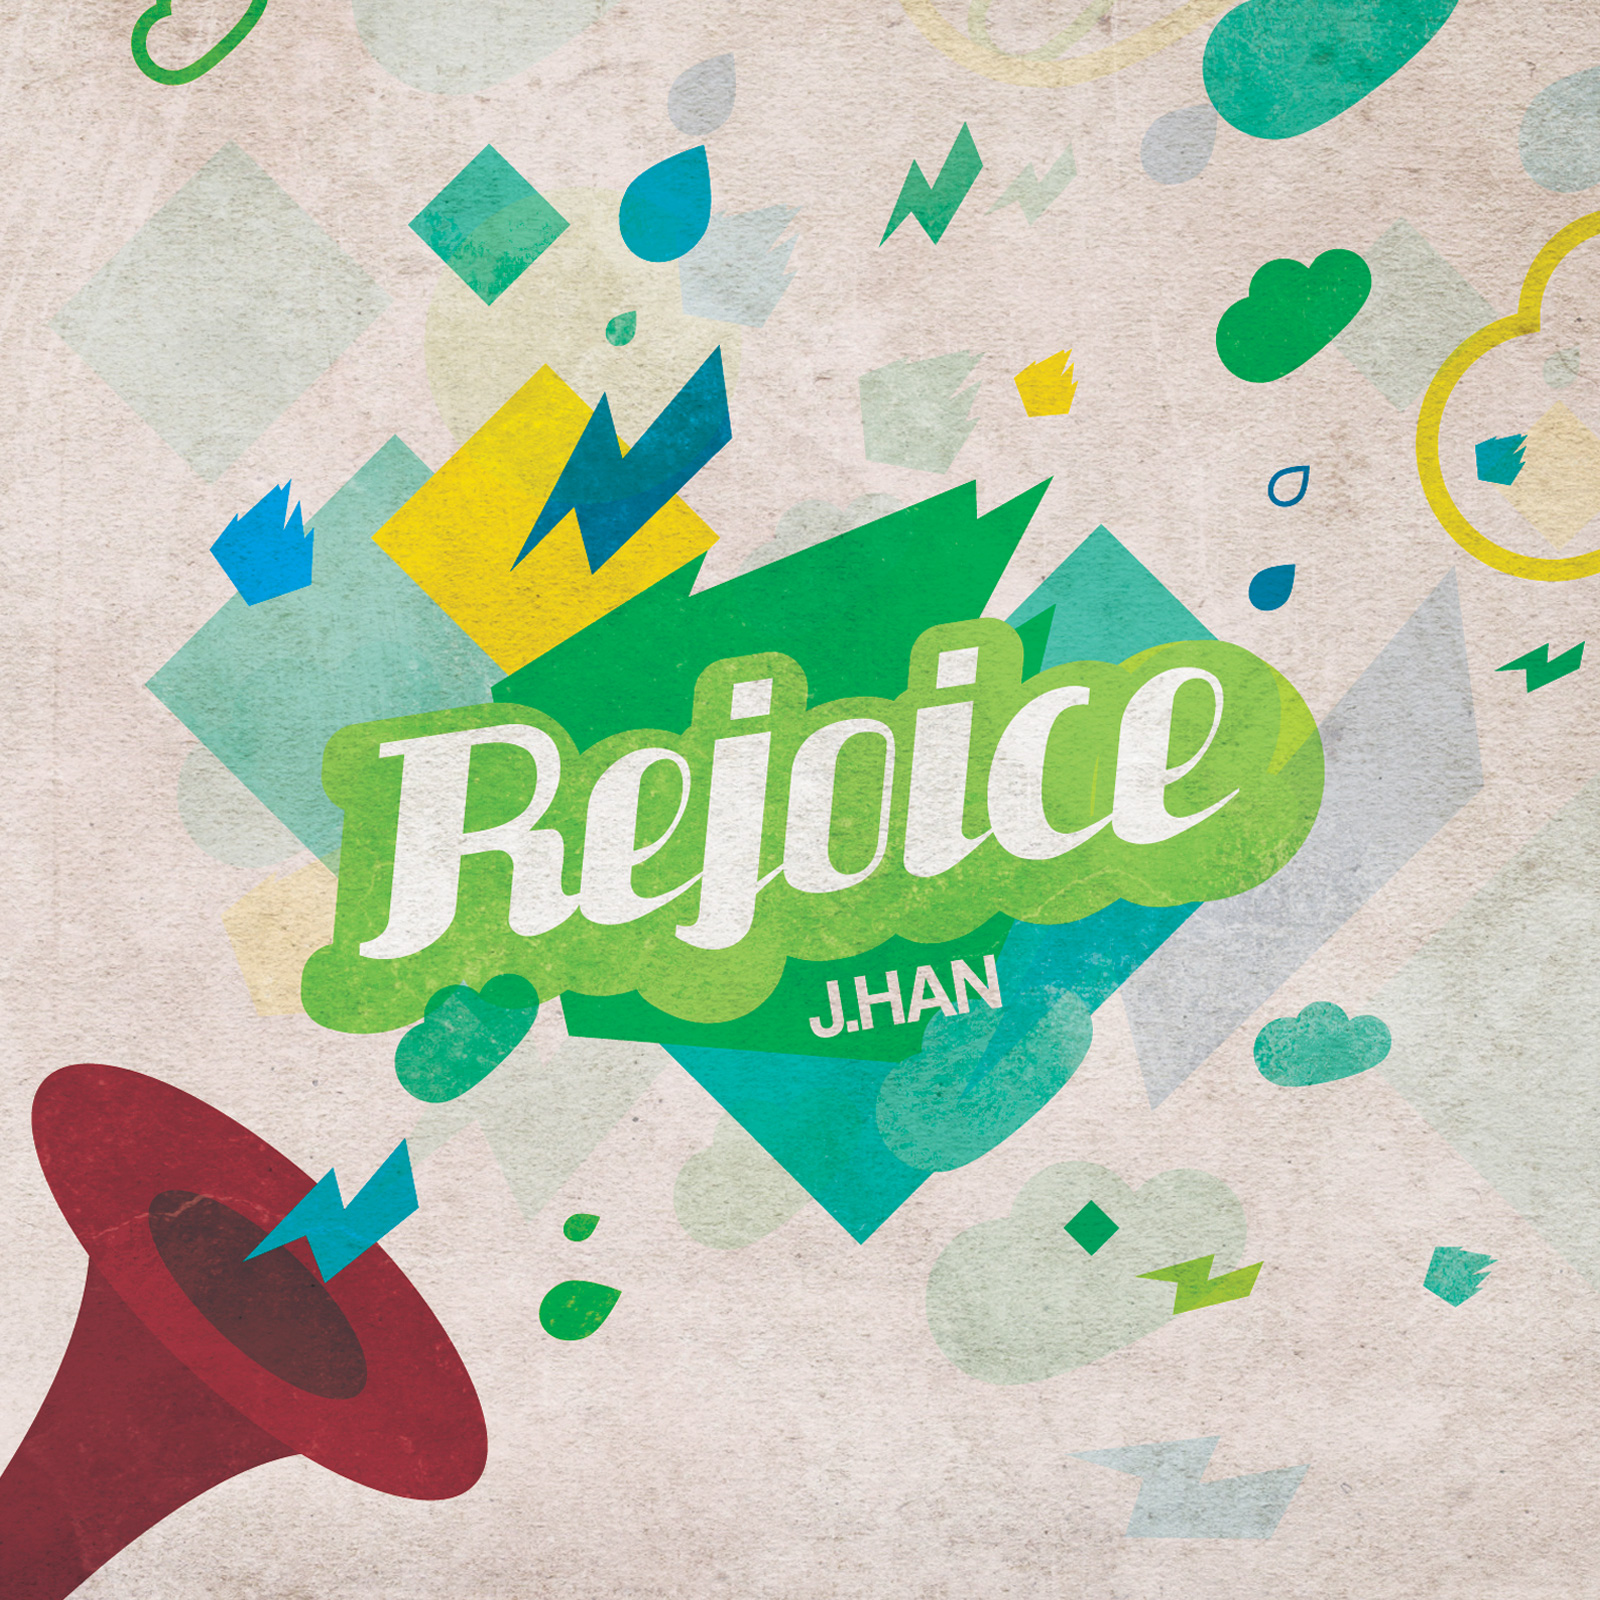 J. Han - Rejoice EP